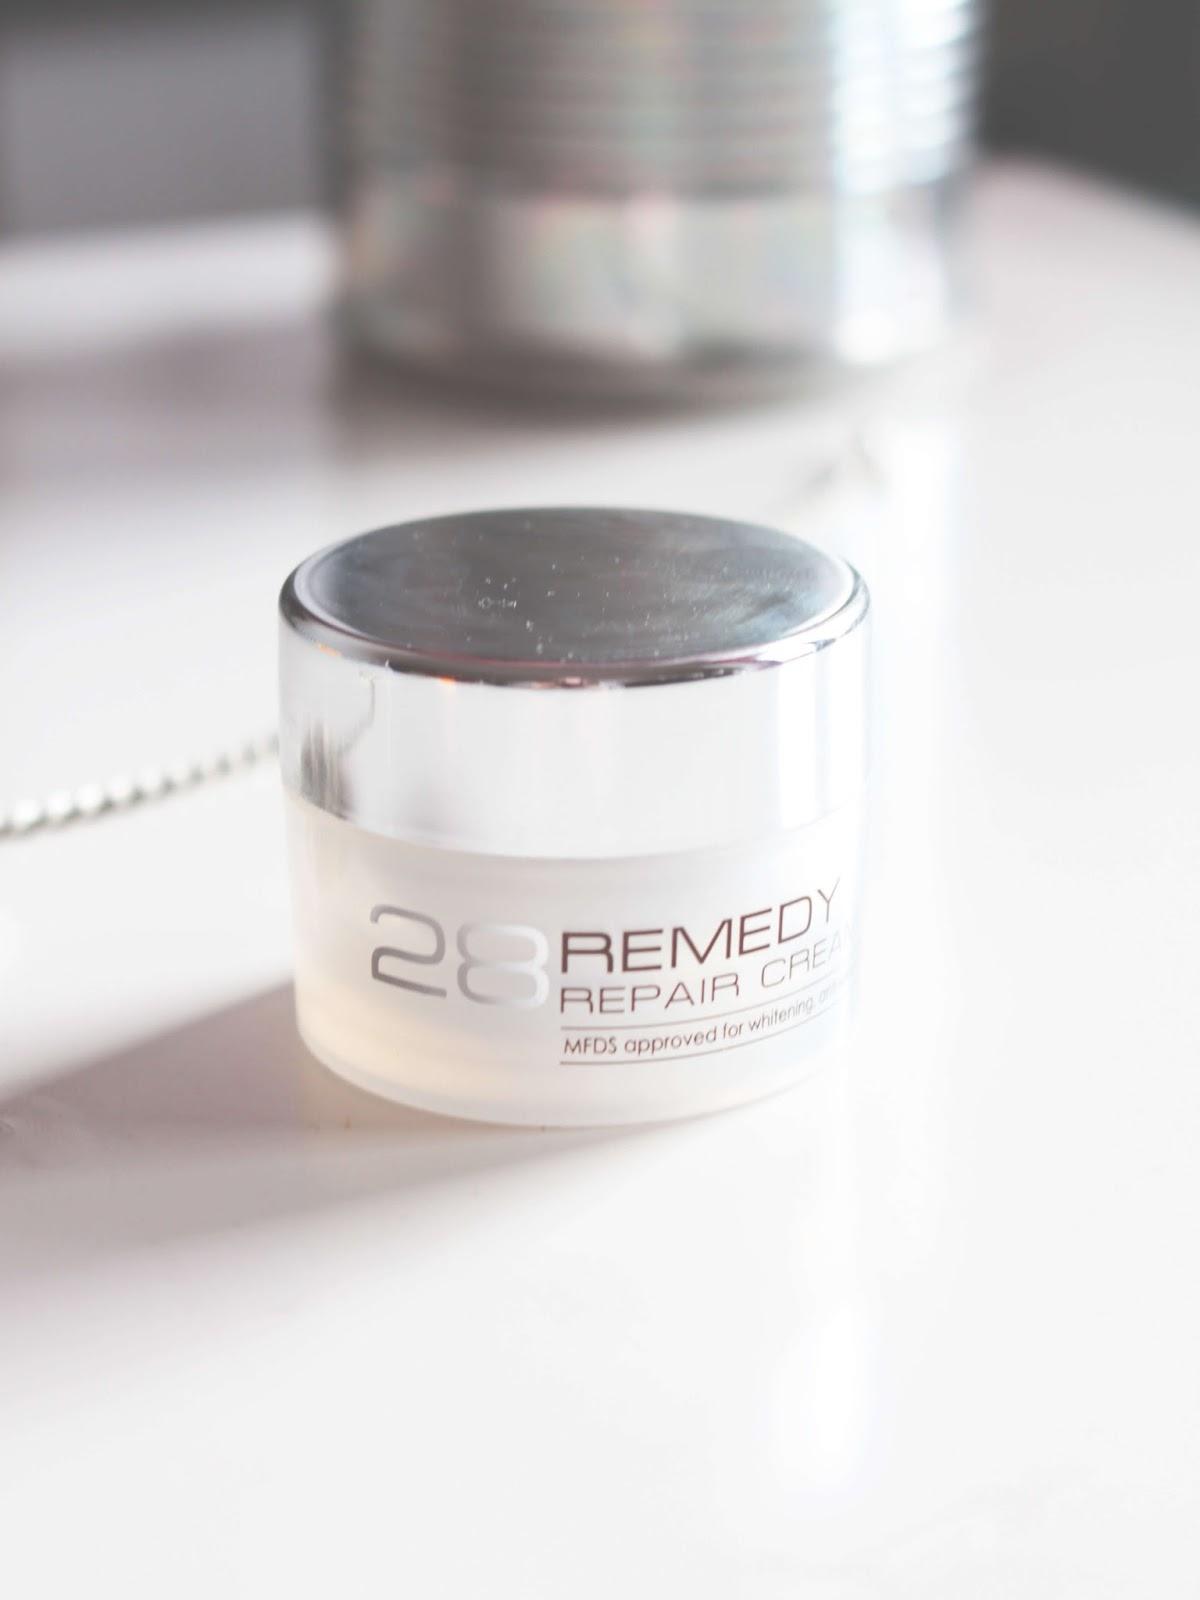 NoTS 28 Remedy Repair Cream review